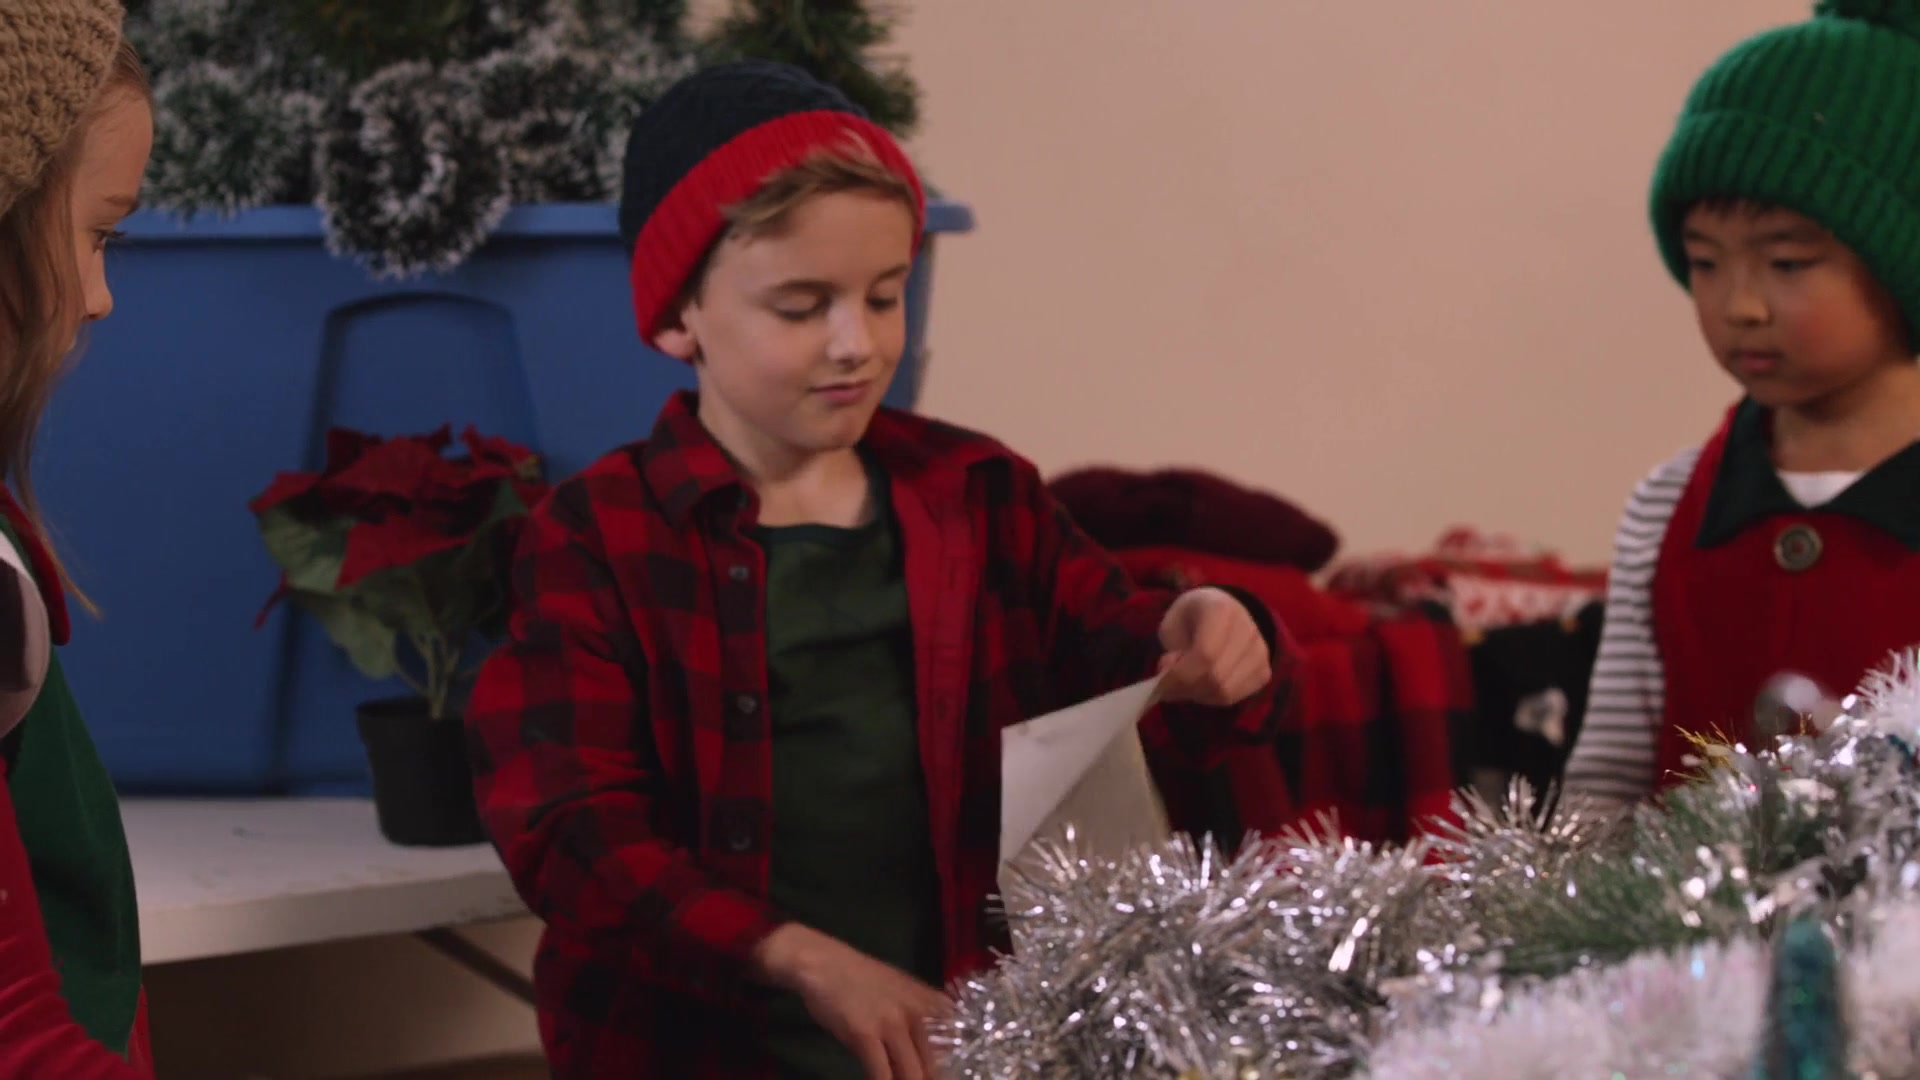 48 Christmas Wishes.48 Christmas Wishes 2017 Avaxhome